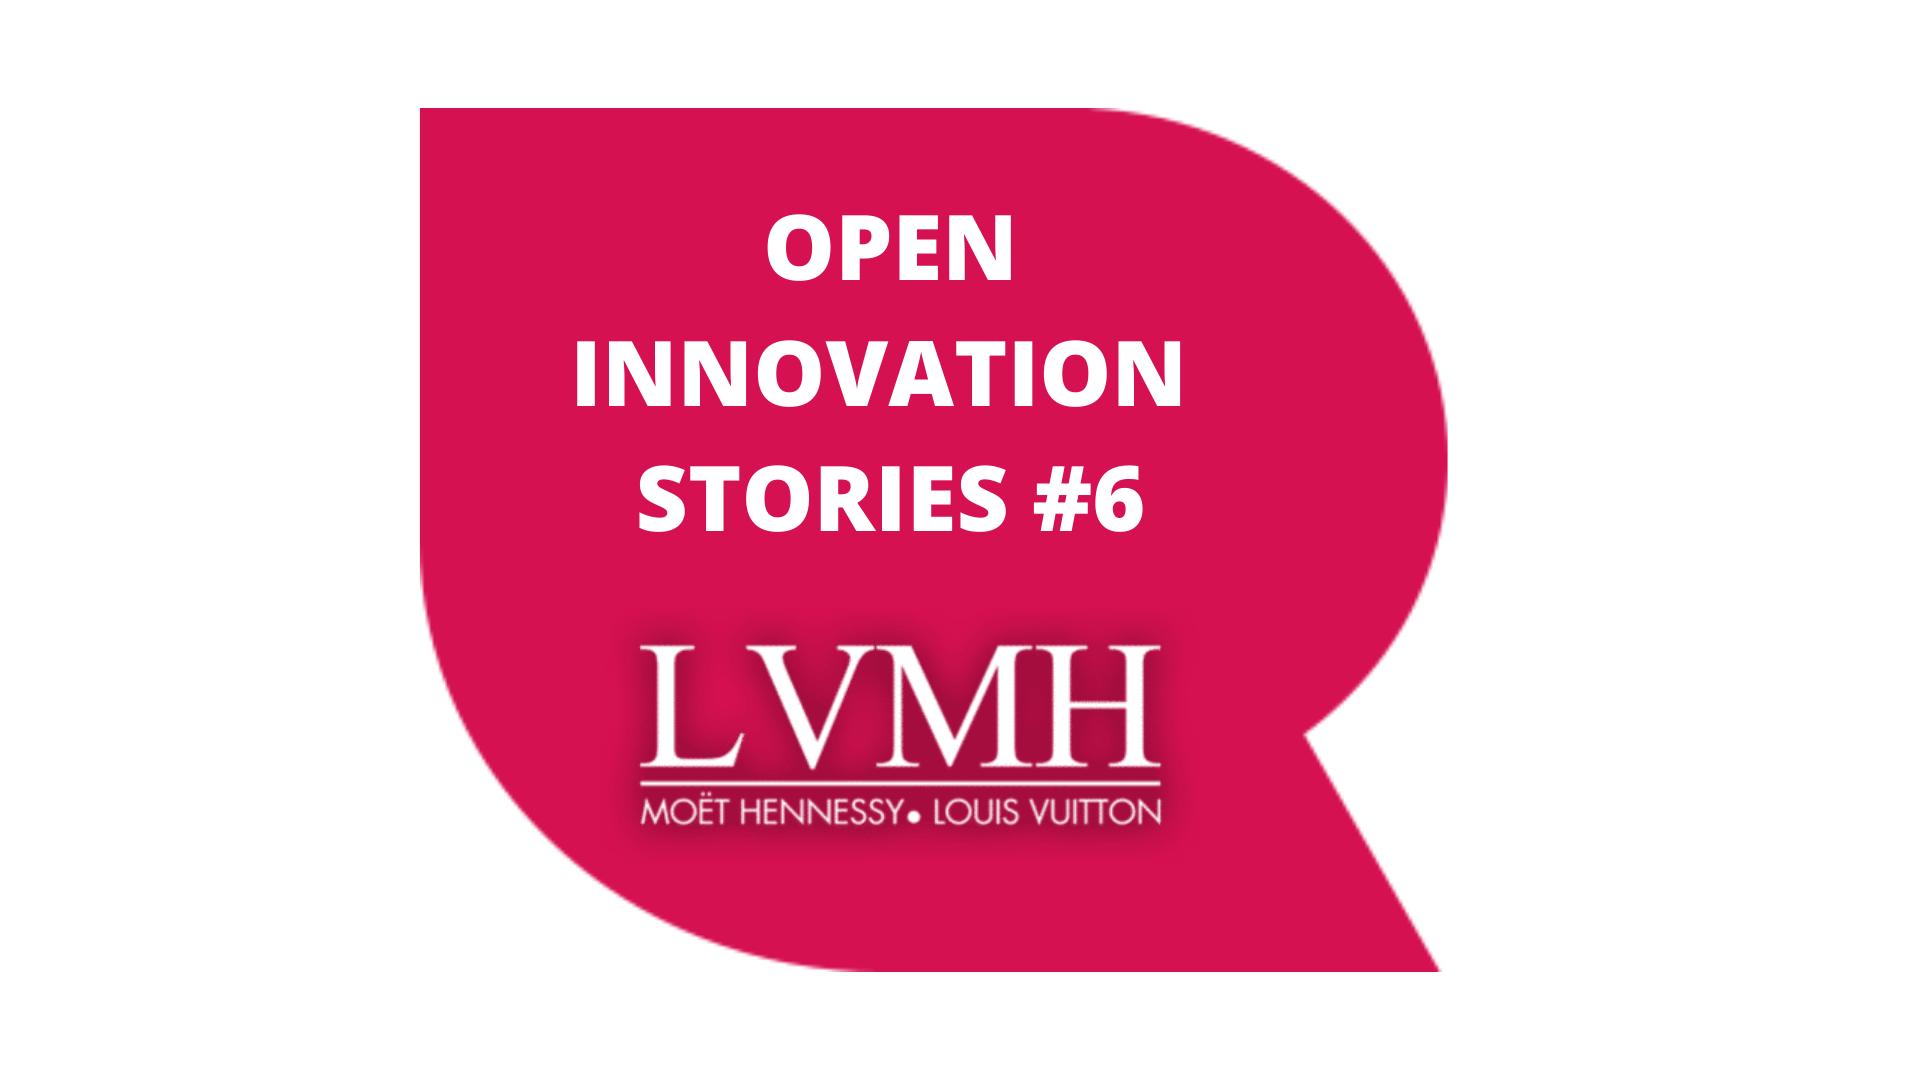 OPEN INNOVATION STORIES  #6